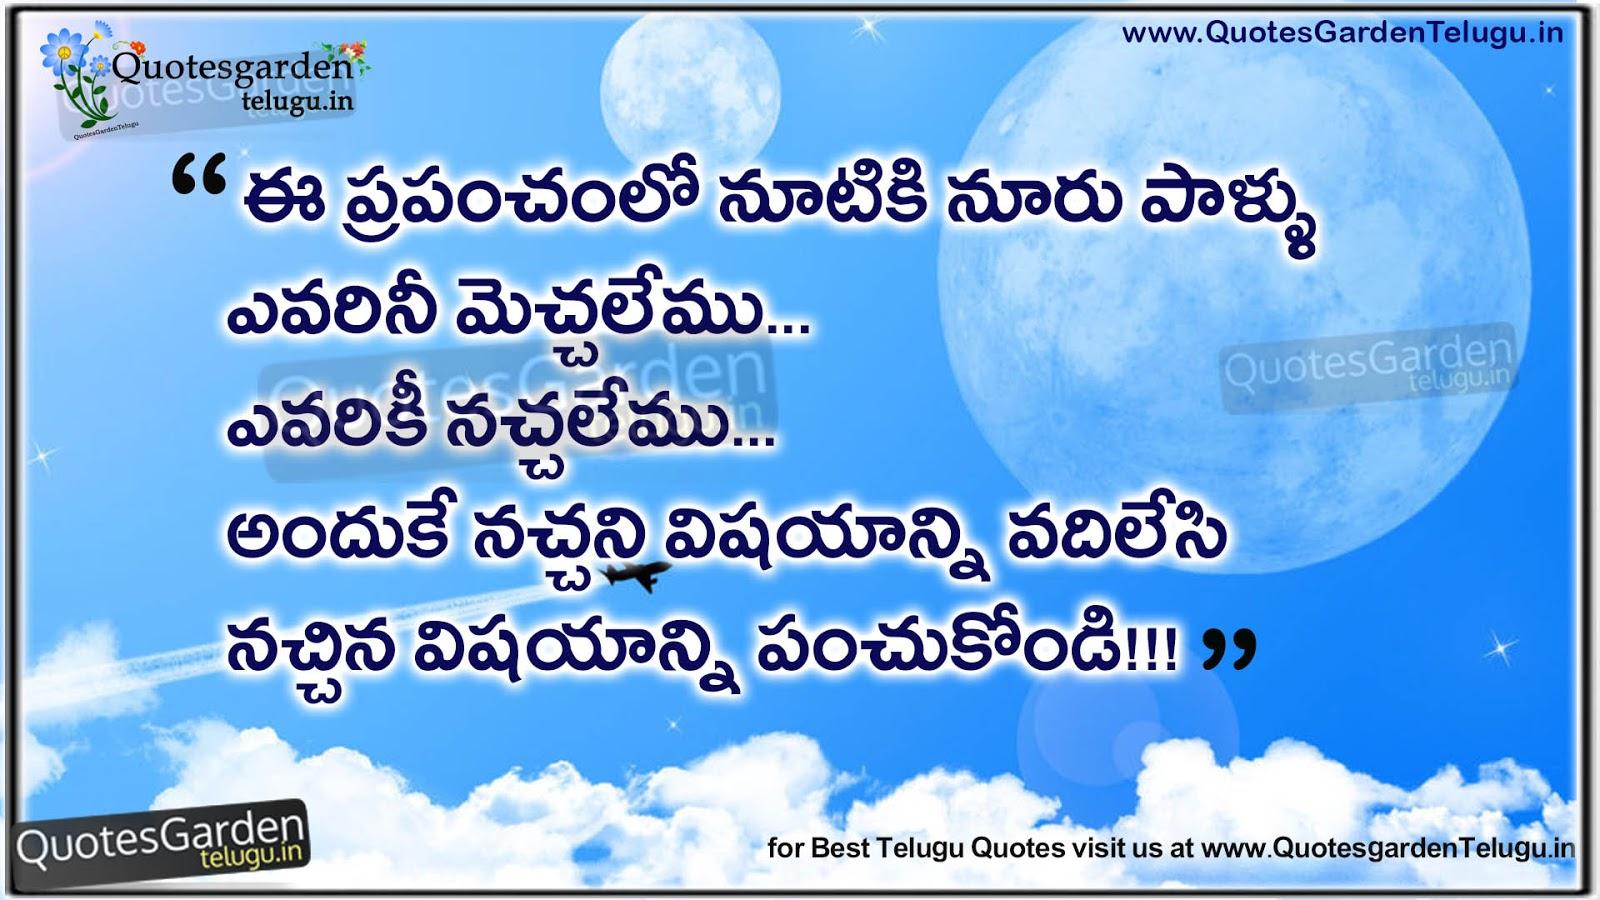 Best Telugu Relationship Status Messages Quotes Garden Telugu